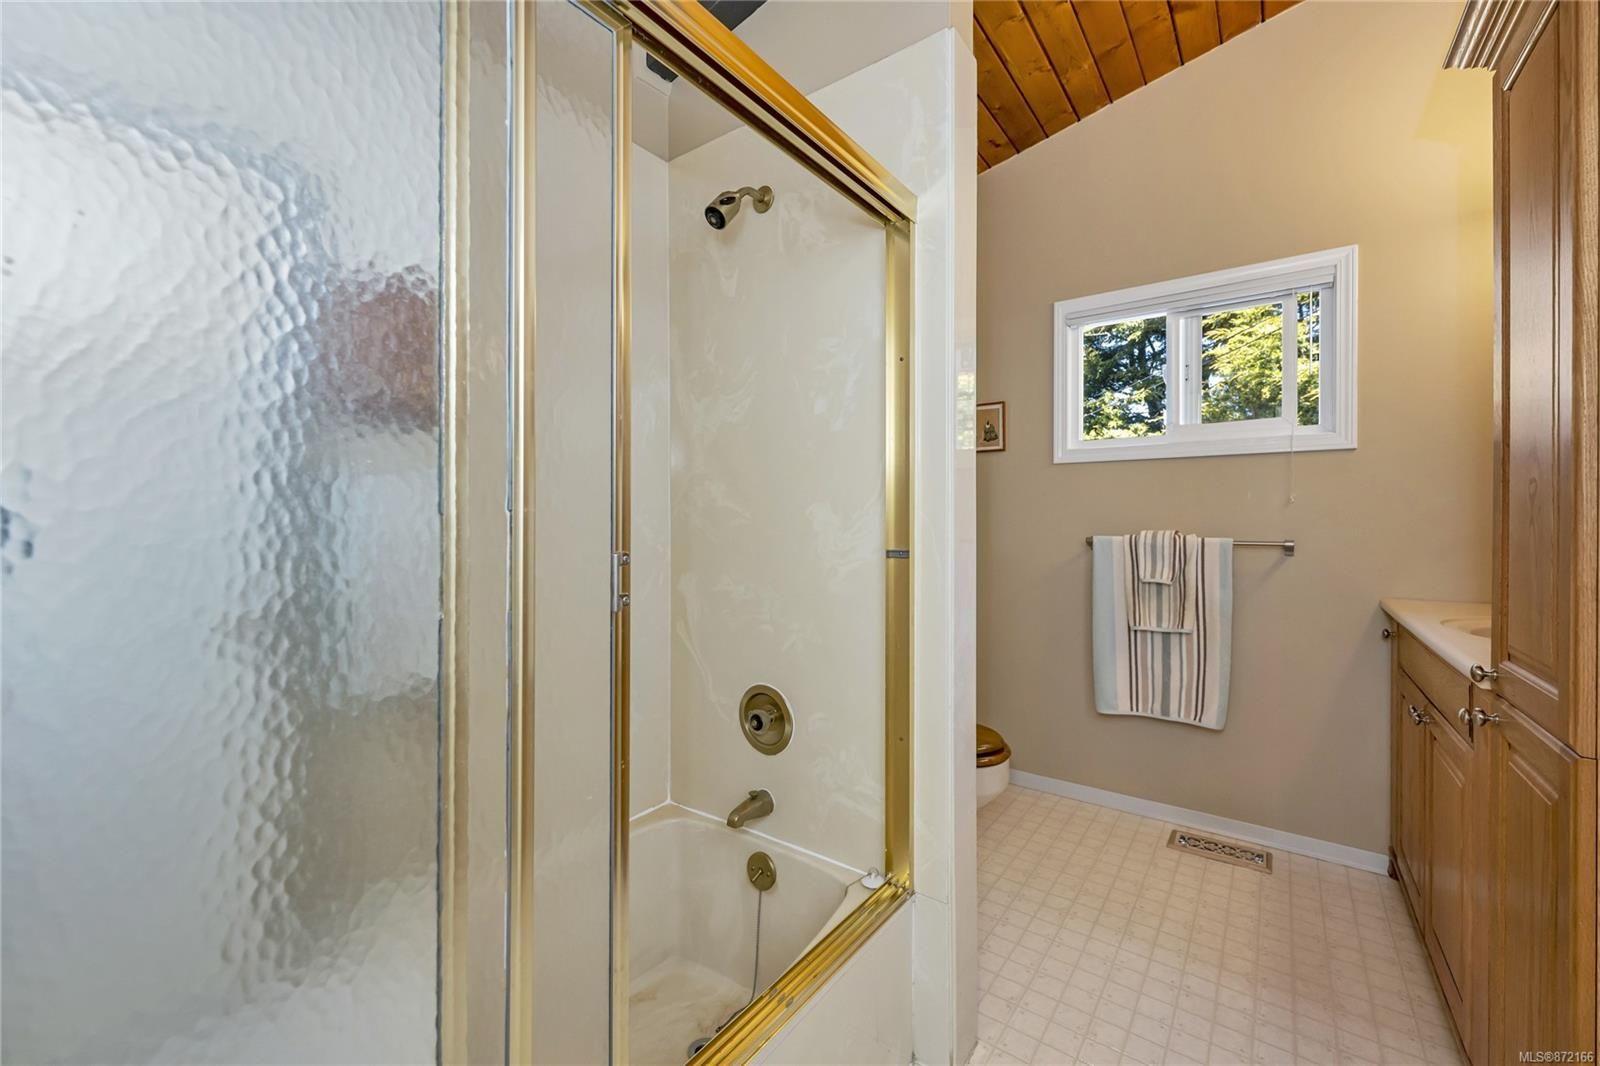 Photo 14: Photos: 1690 Blair Ave in : SE Lambrick Park House for sale (Saanich East)  : MLS®# 872166